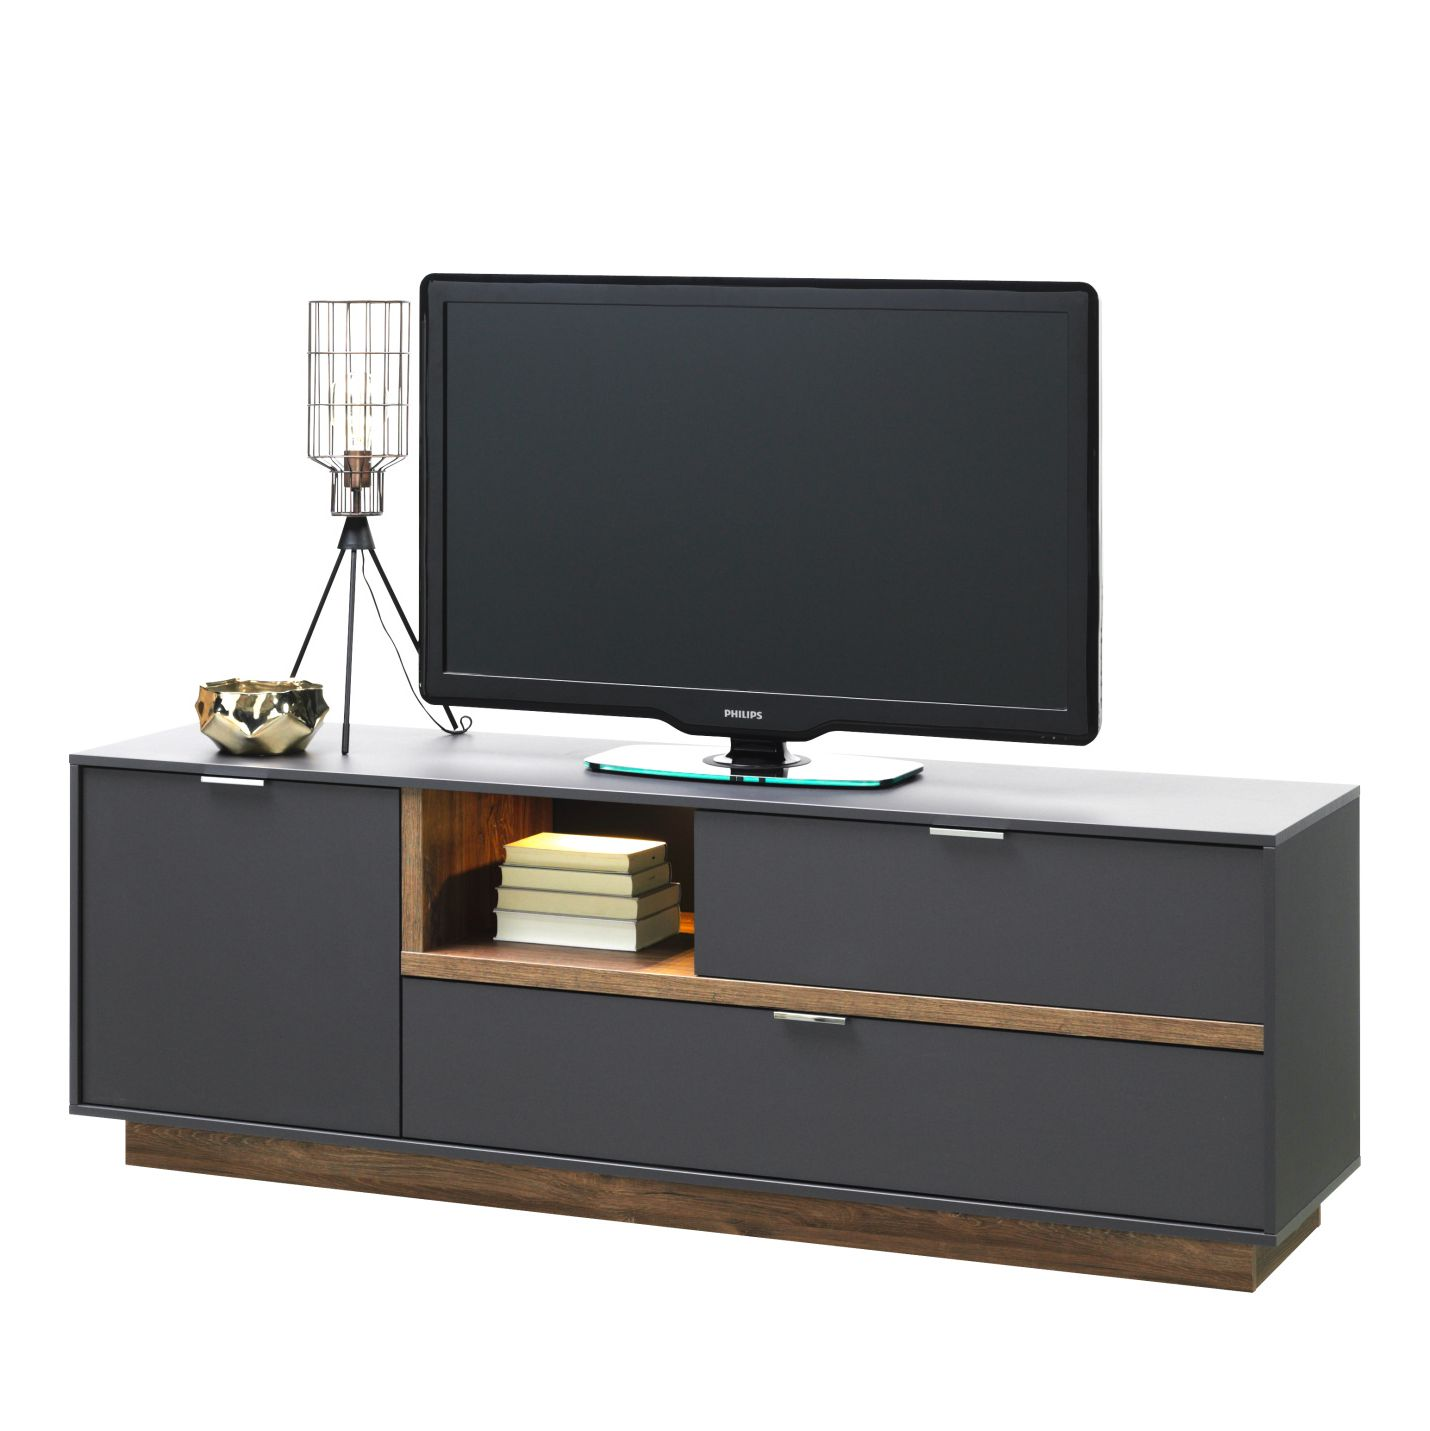 Meuble TV My Ell II - Graphite / Imitation chêne de Stirling, Cs Schmal